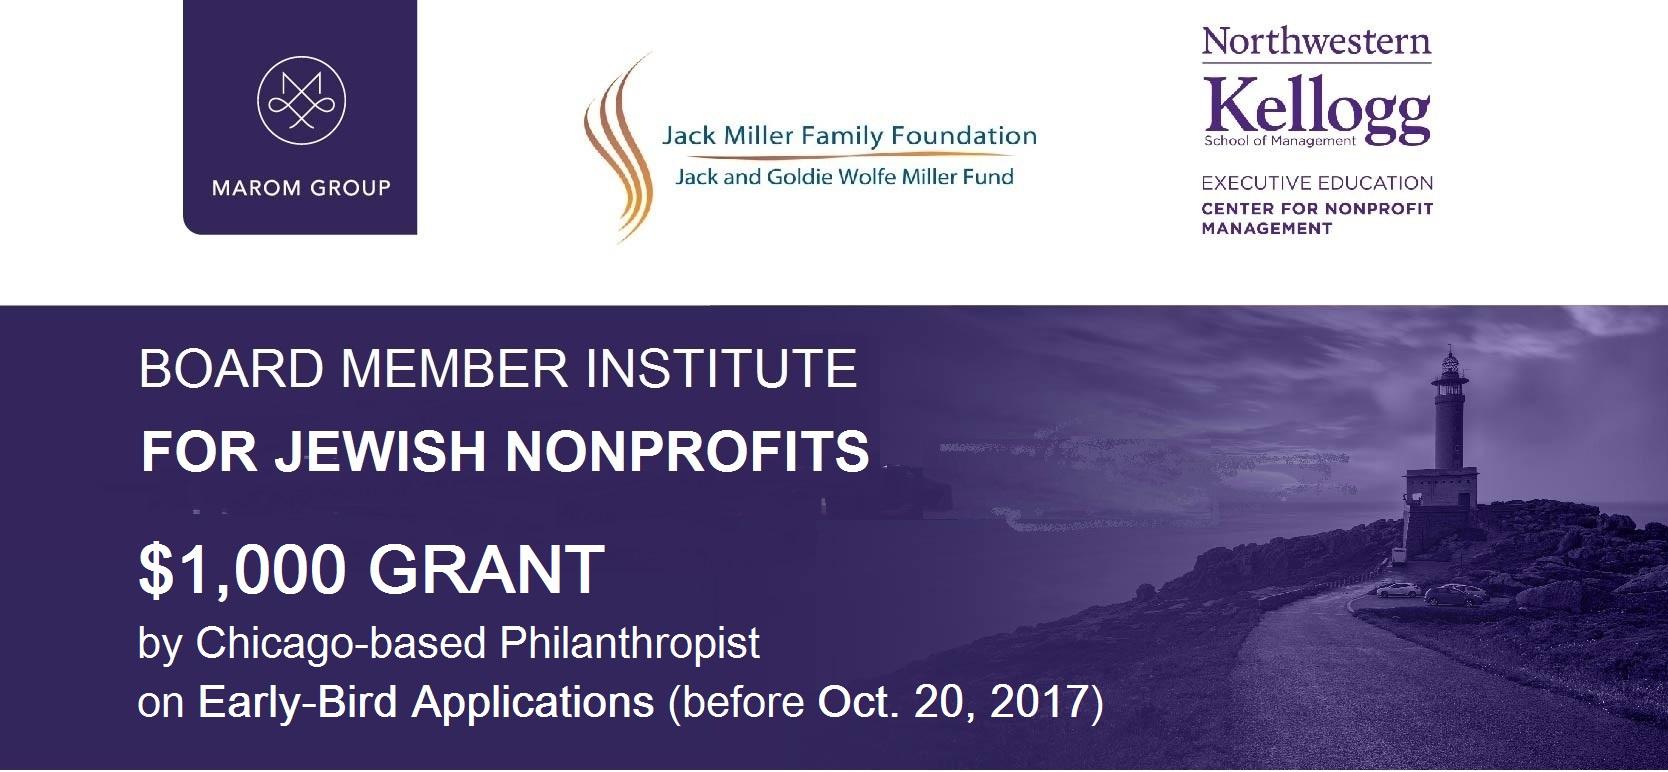 Board Member Institute For Jewish Nonprofits